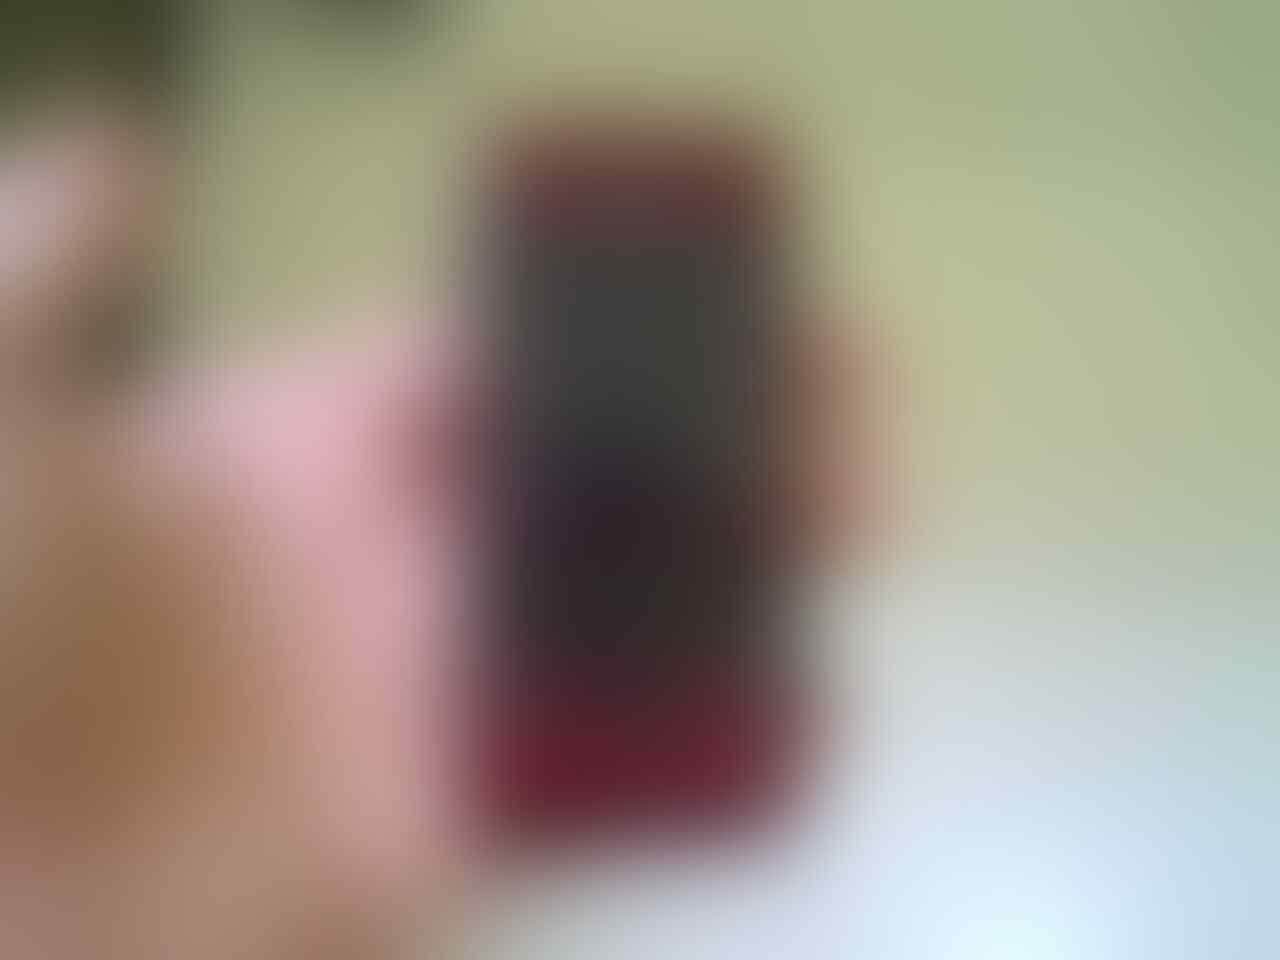 BB Pearl 9105 Red Lengkap Garansi Tam 99% Mulus Cuman 1.450rb